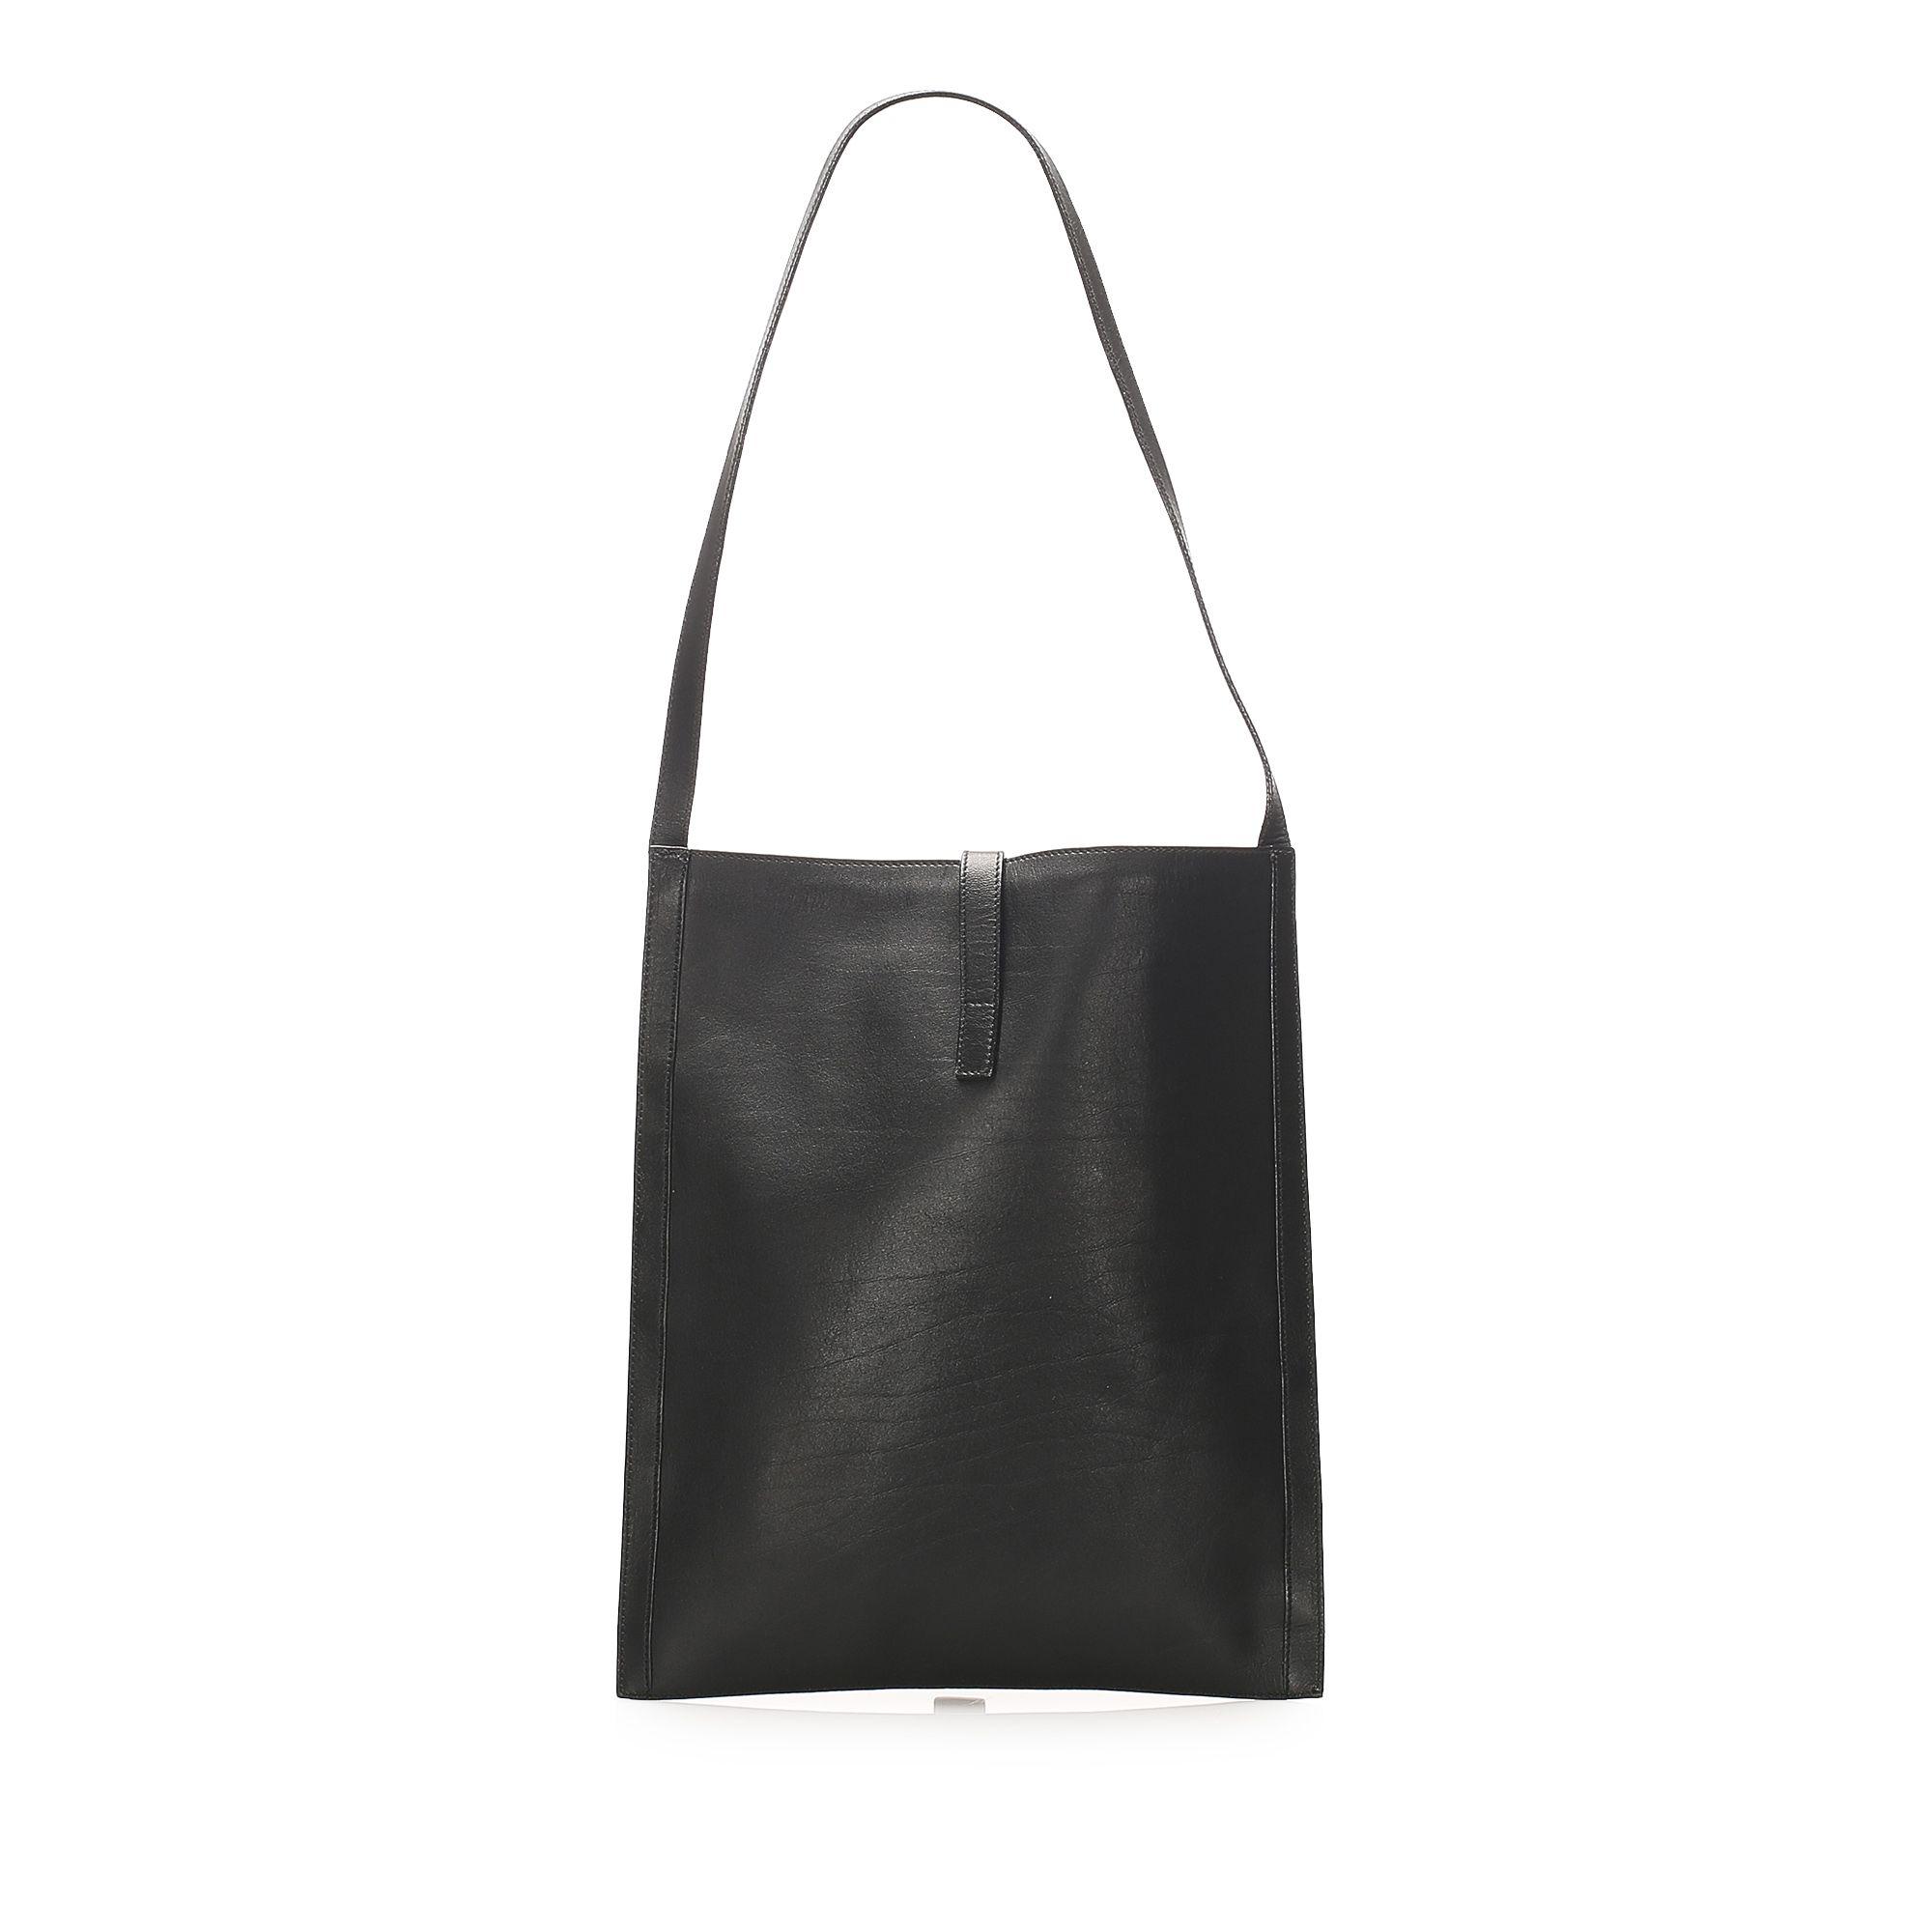 Vintage Gucci Leather Tote Bag Black